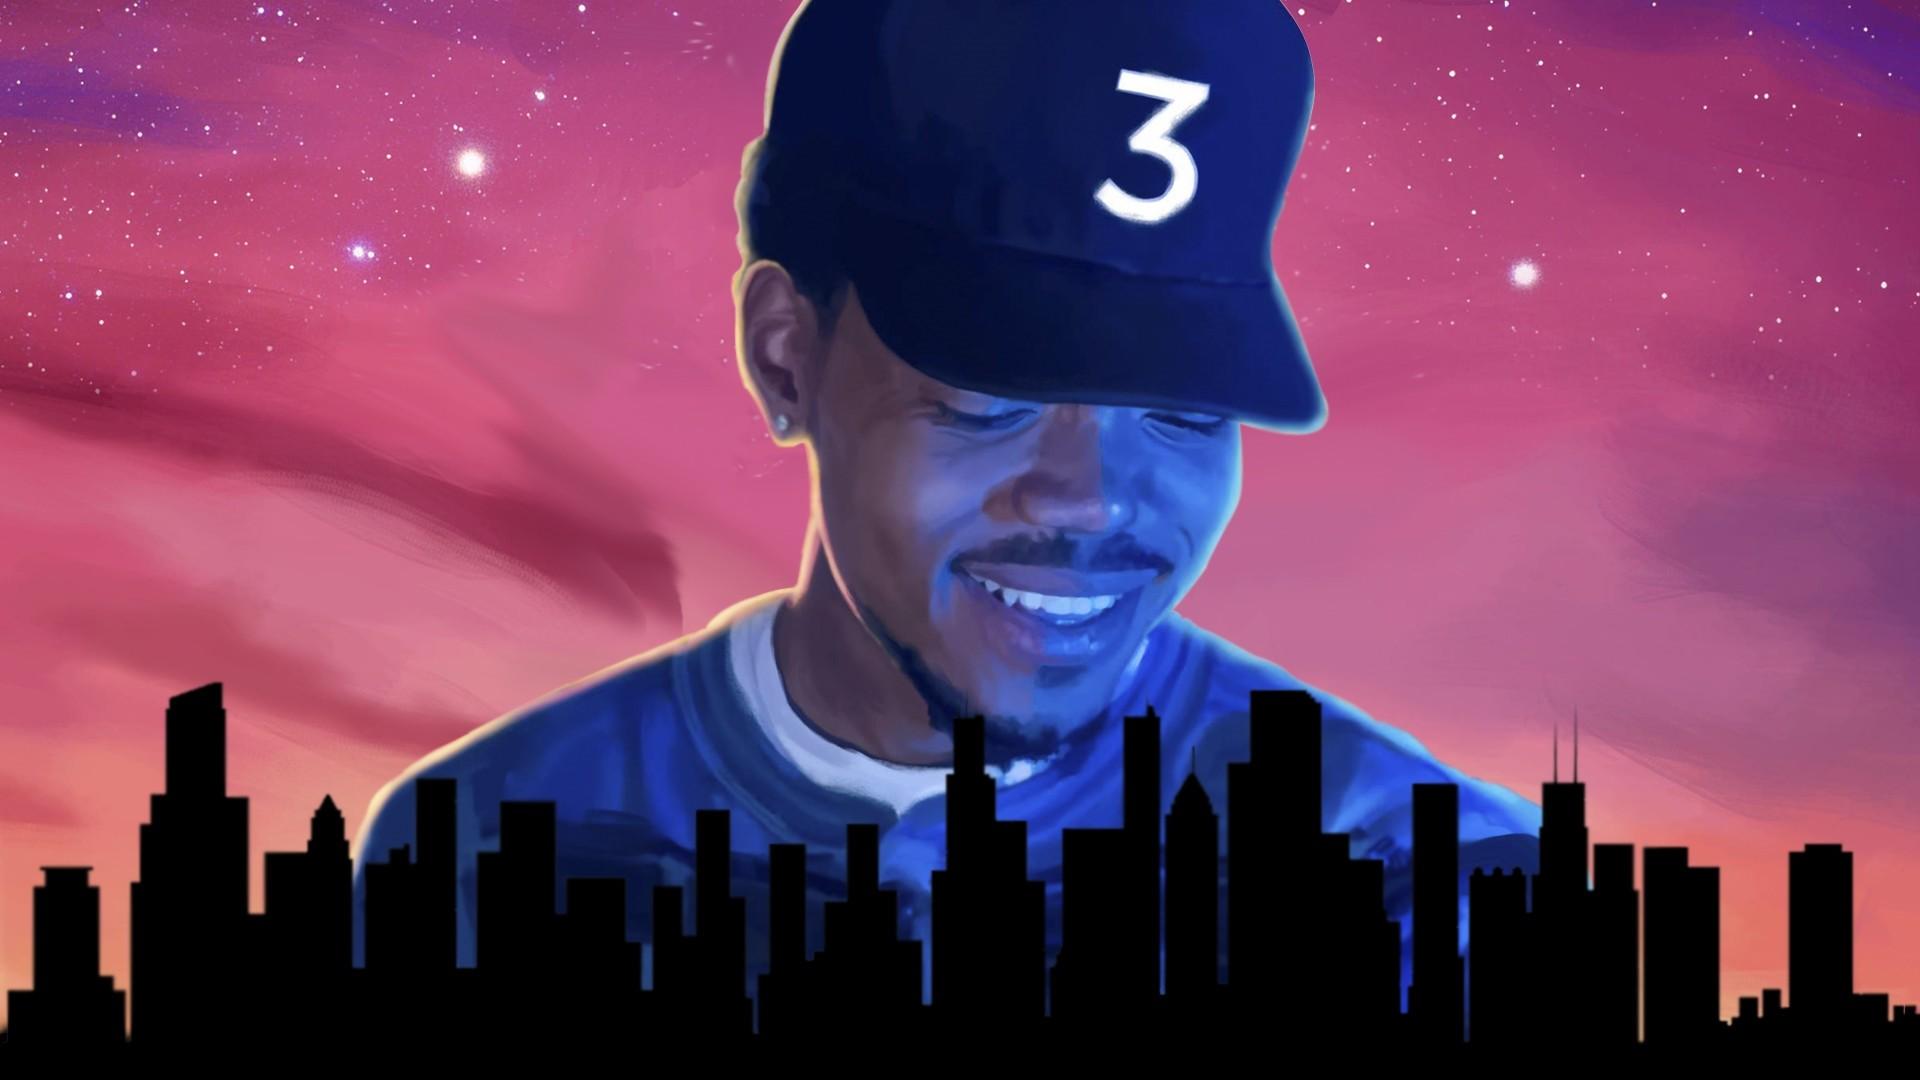 Chance The Rapper wallpaper photo hd